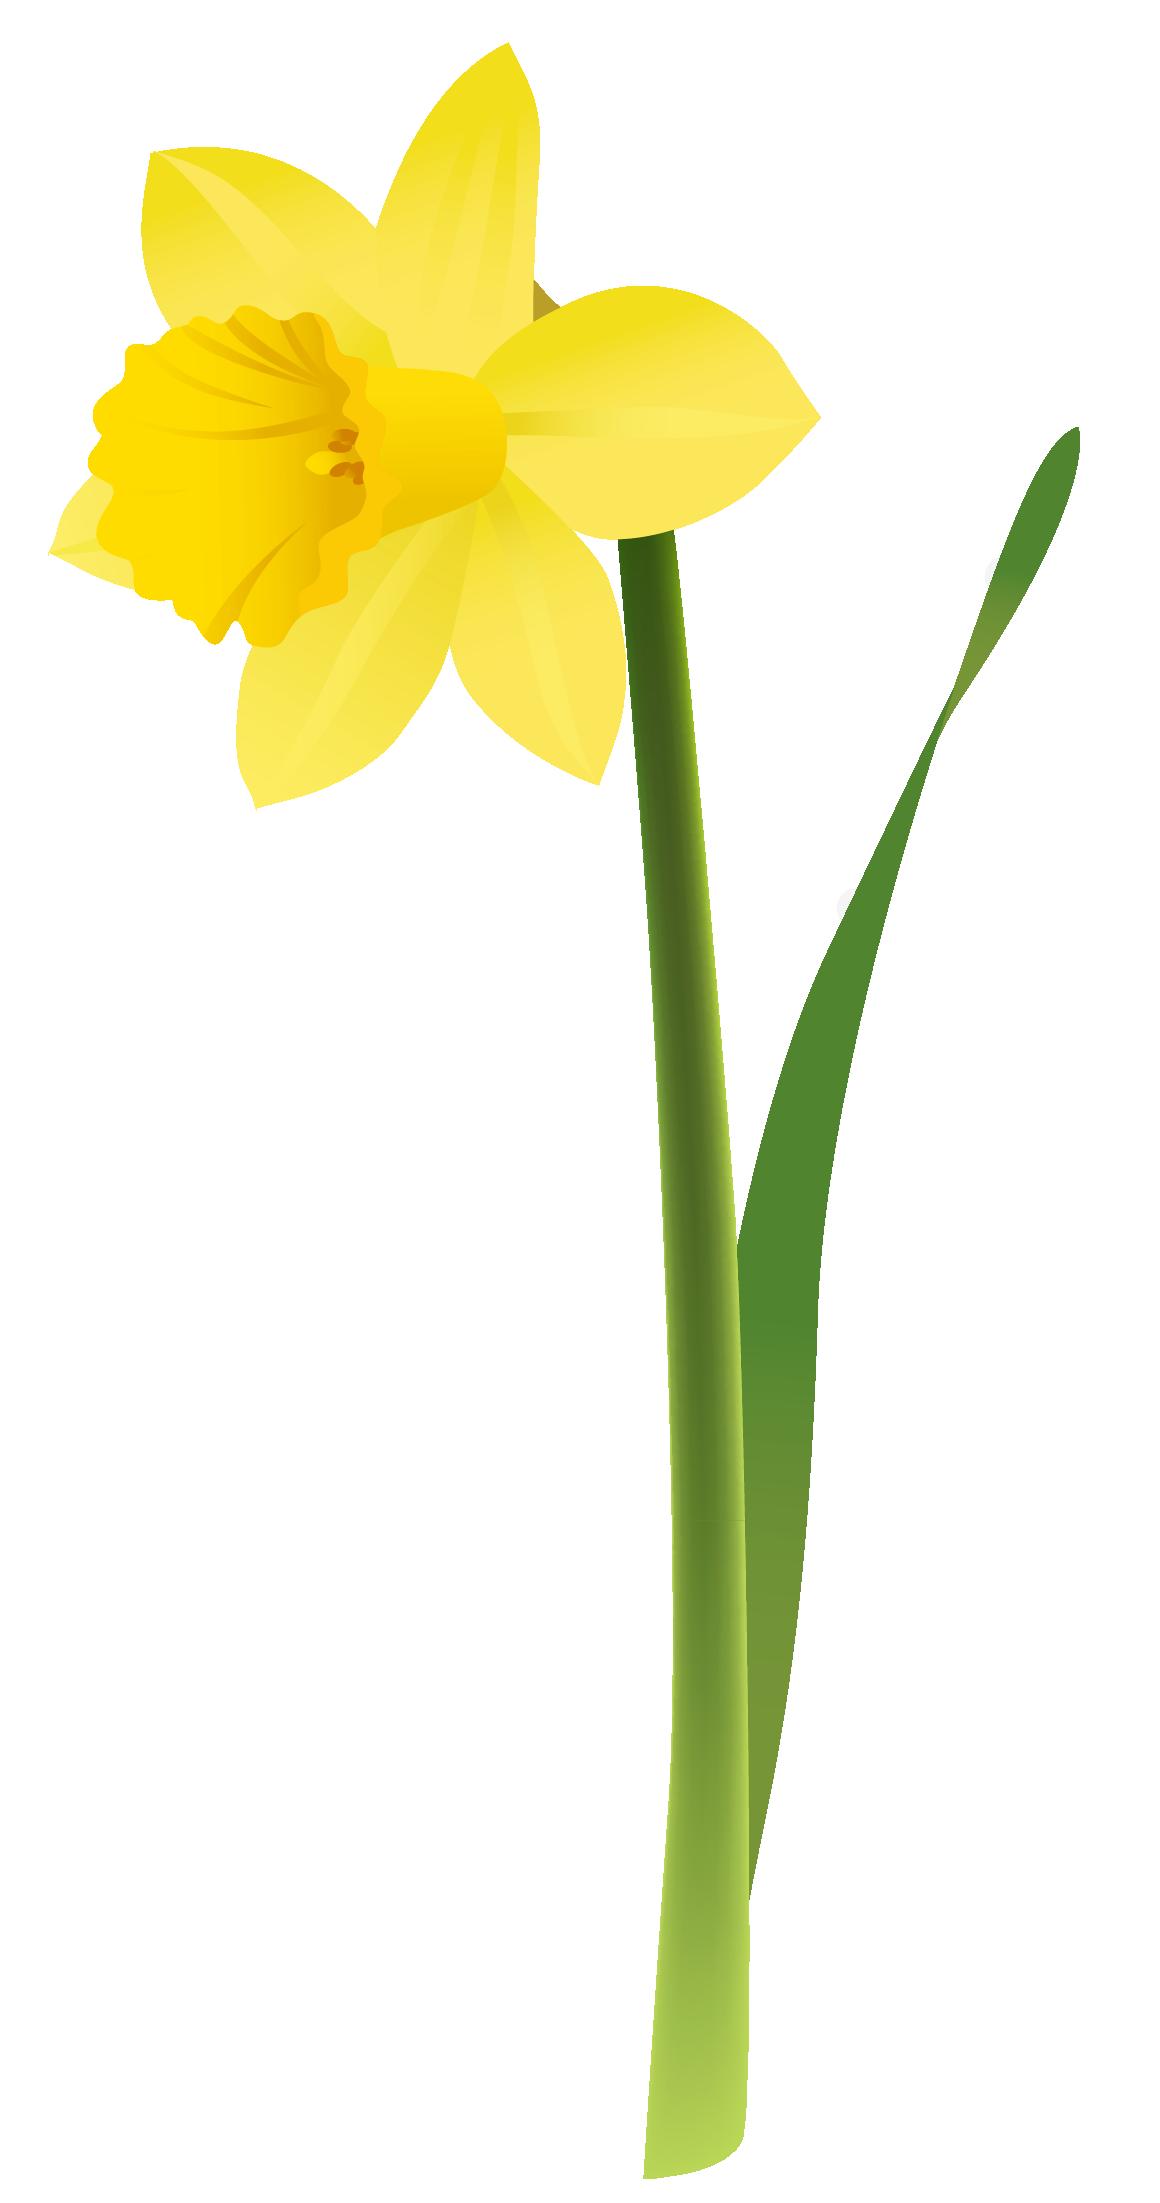 daffodil clip art free cliparts tattoos pinterest daffodil clip art border free daffodil clip art border free